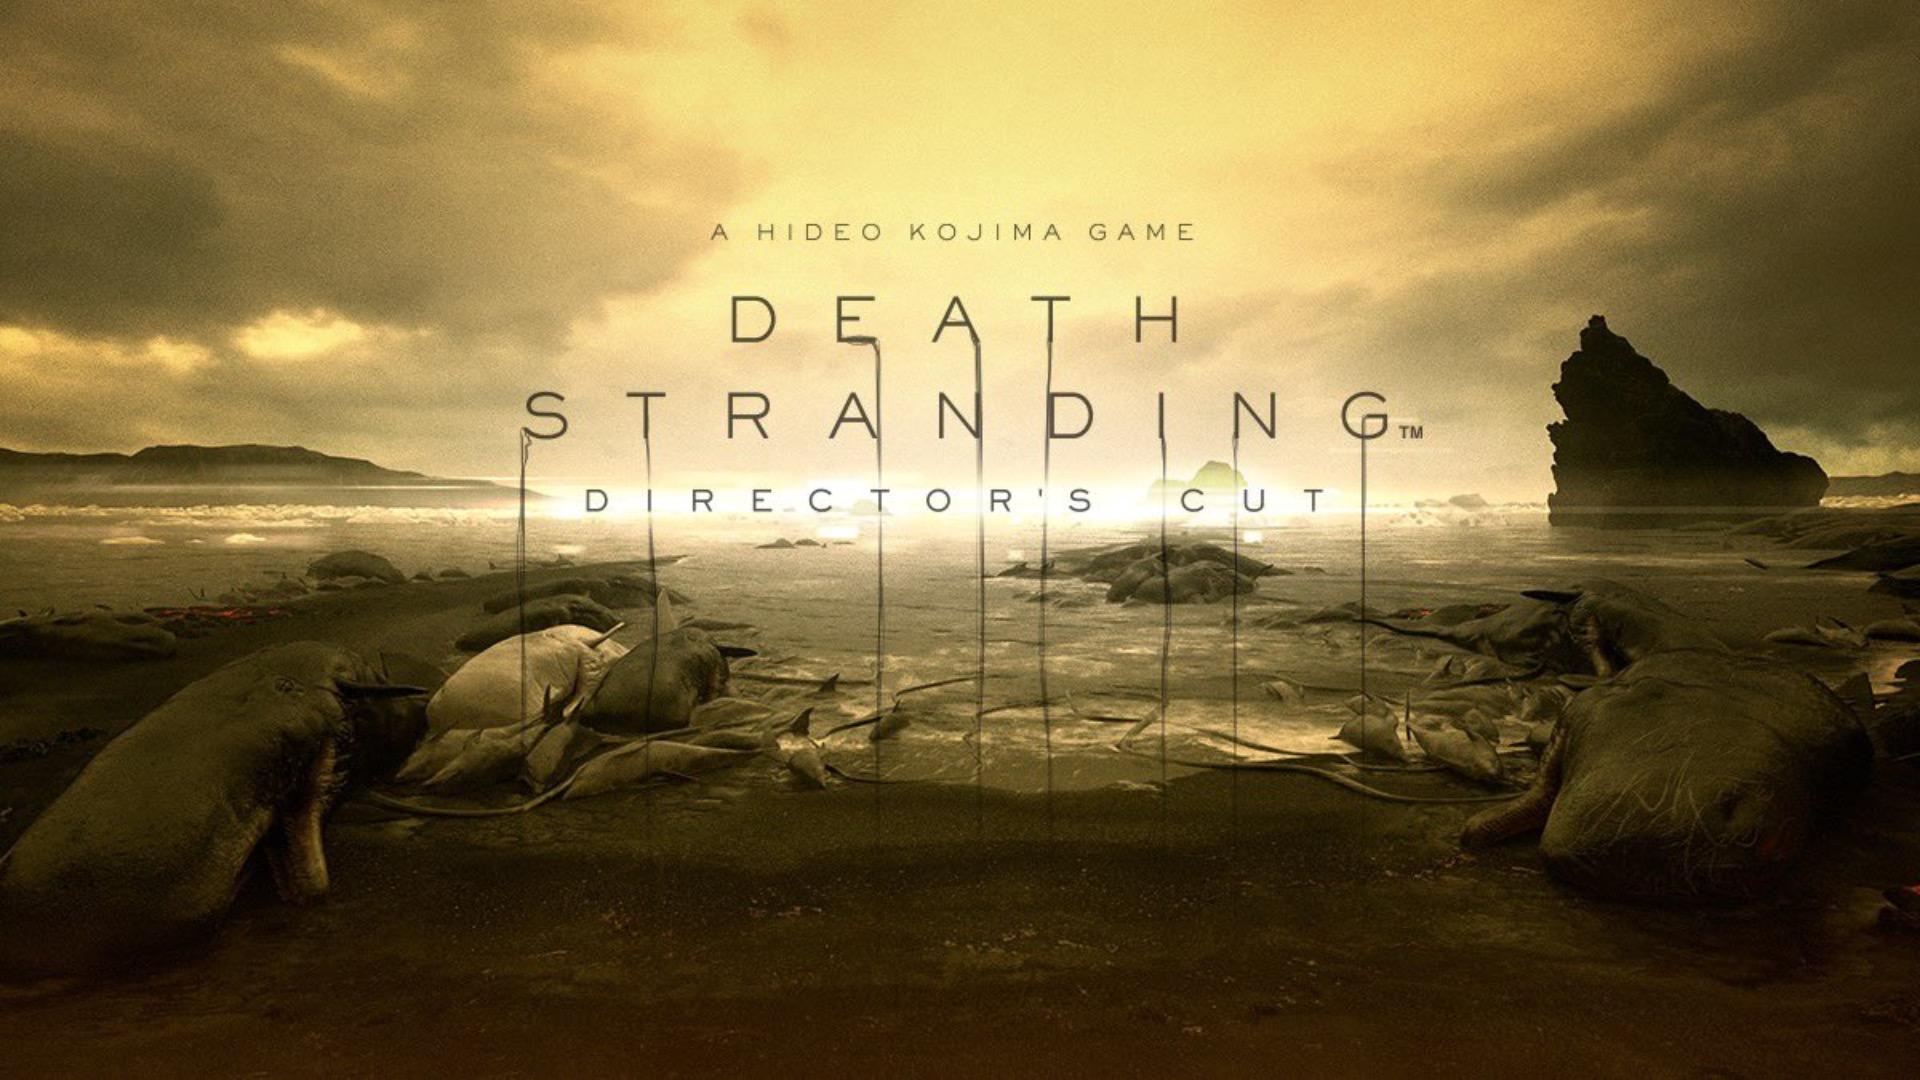 تریلر گیم پلی نسخه Director's Cut بازی Death Stranding